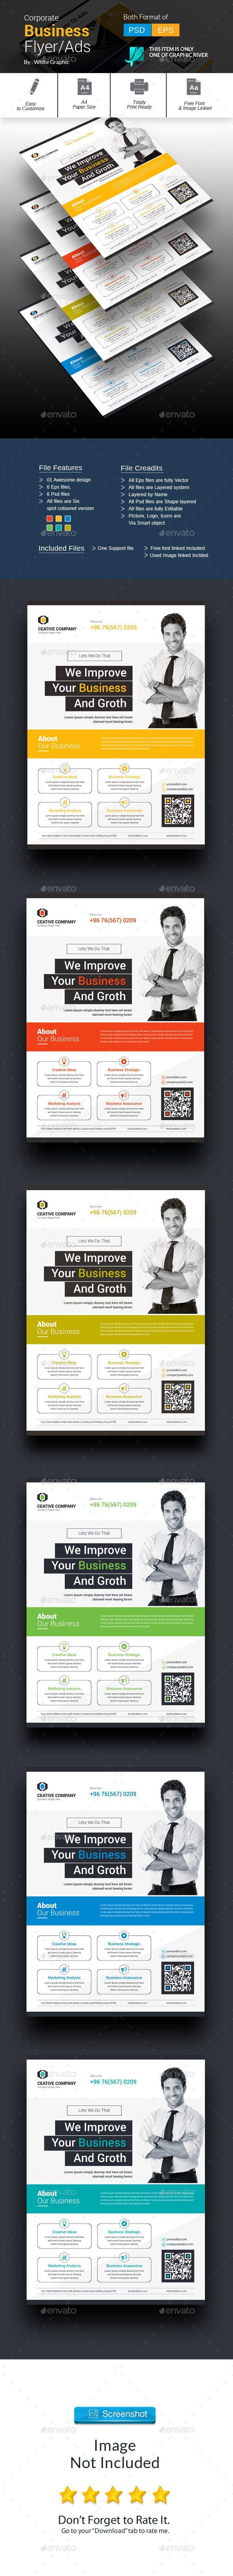 Corporate Flyer Template PSD, EPS, AI #design Download: http://graphicriver.net/item/corporate-flyer/13610888?ref=ksioks